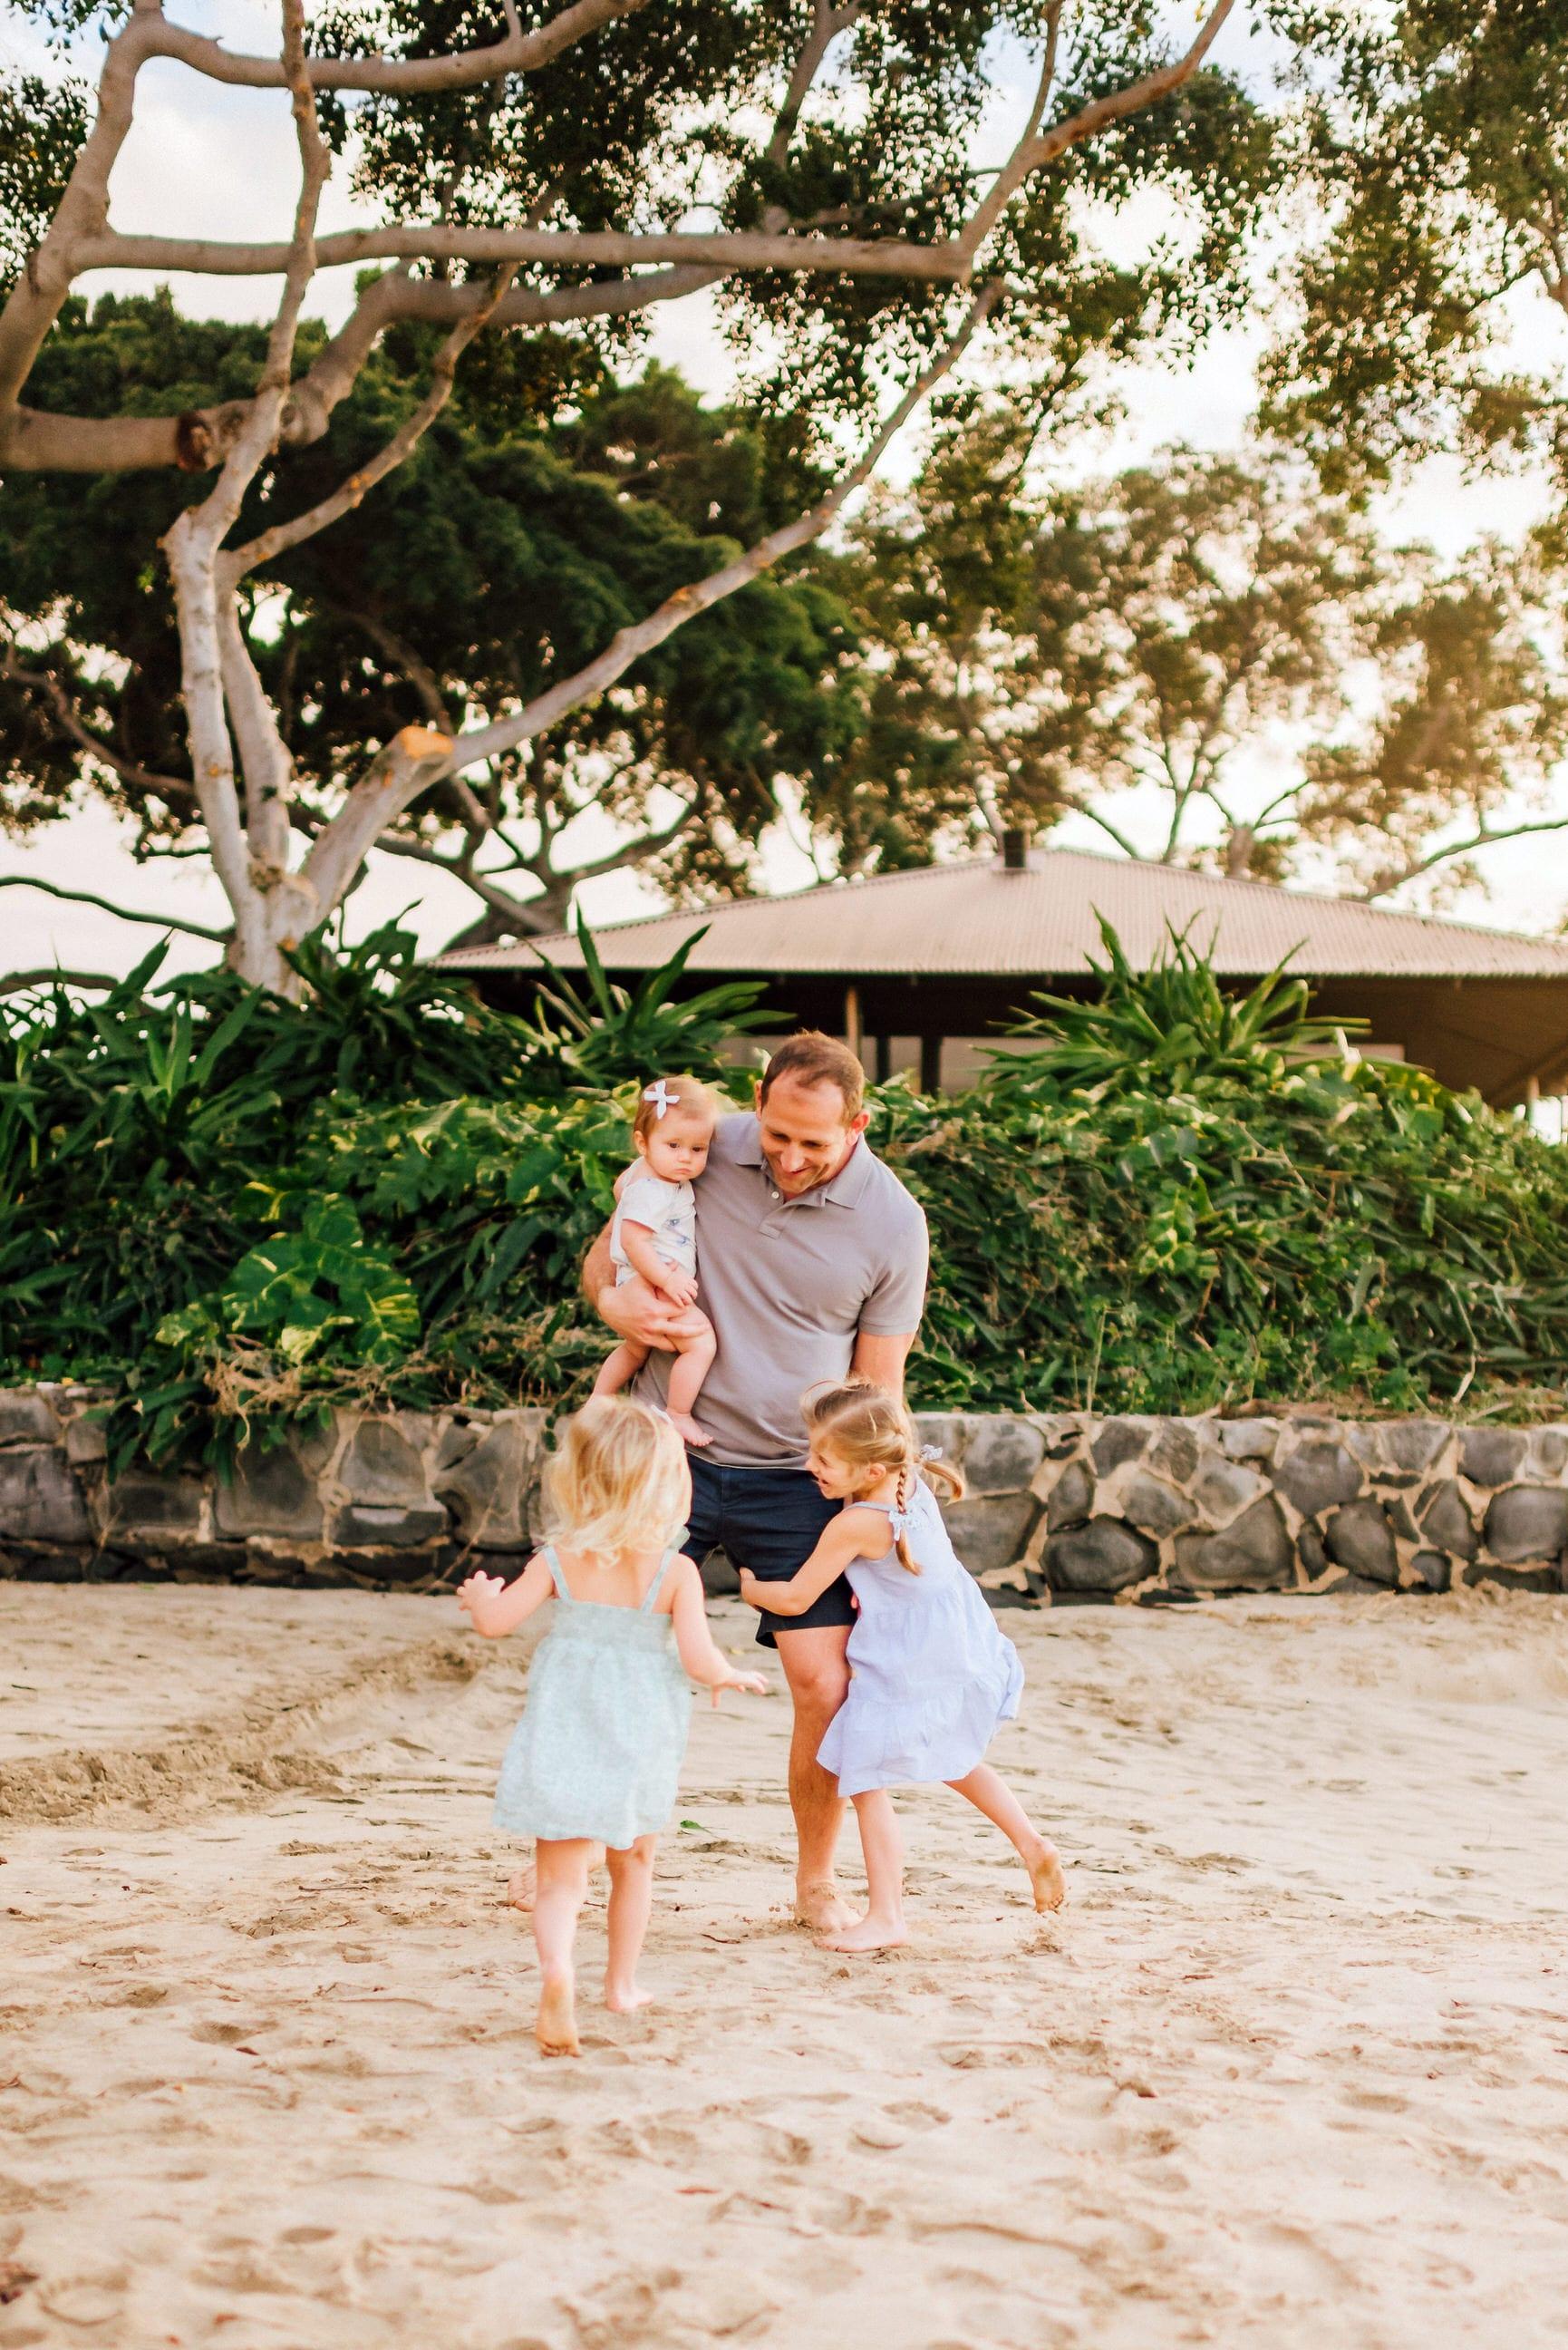 Family-Pictures-Hawaii-Mauna-Kea-Beach-11.jpg